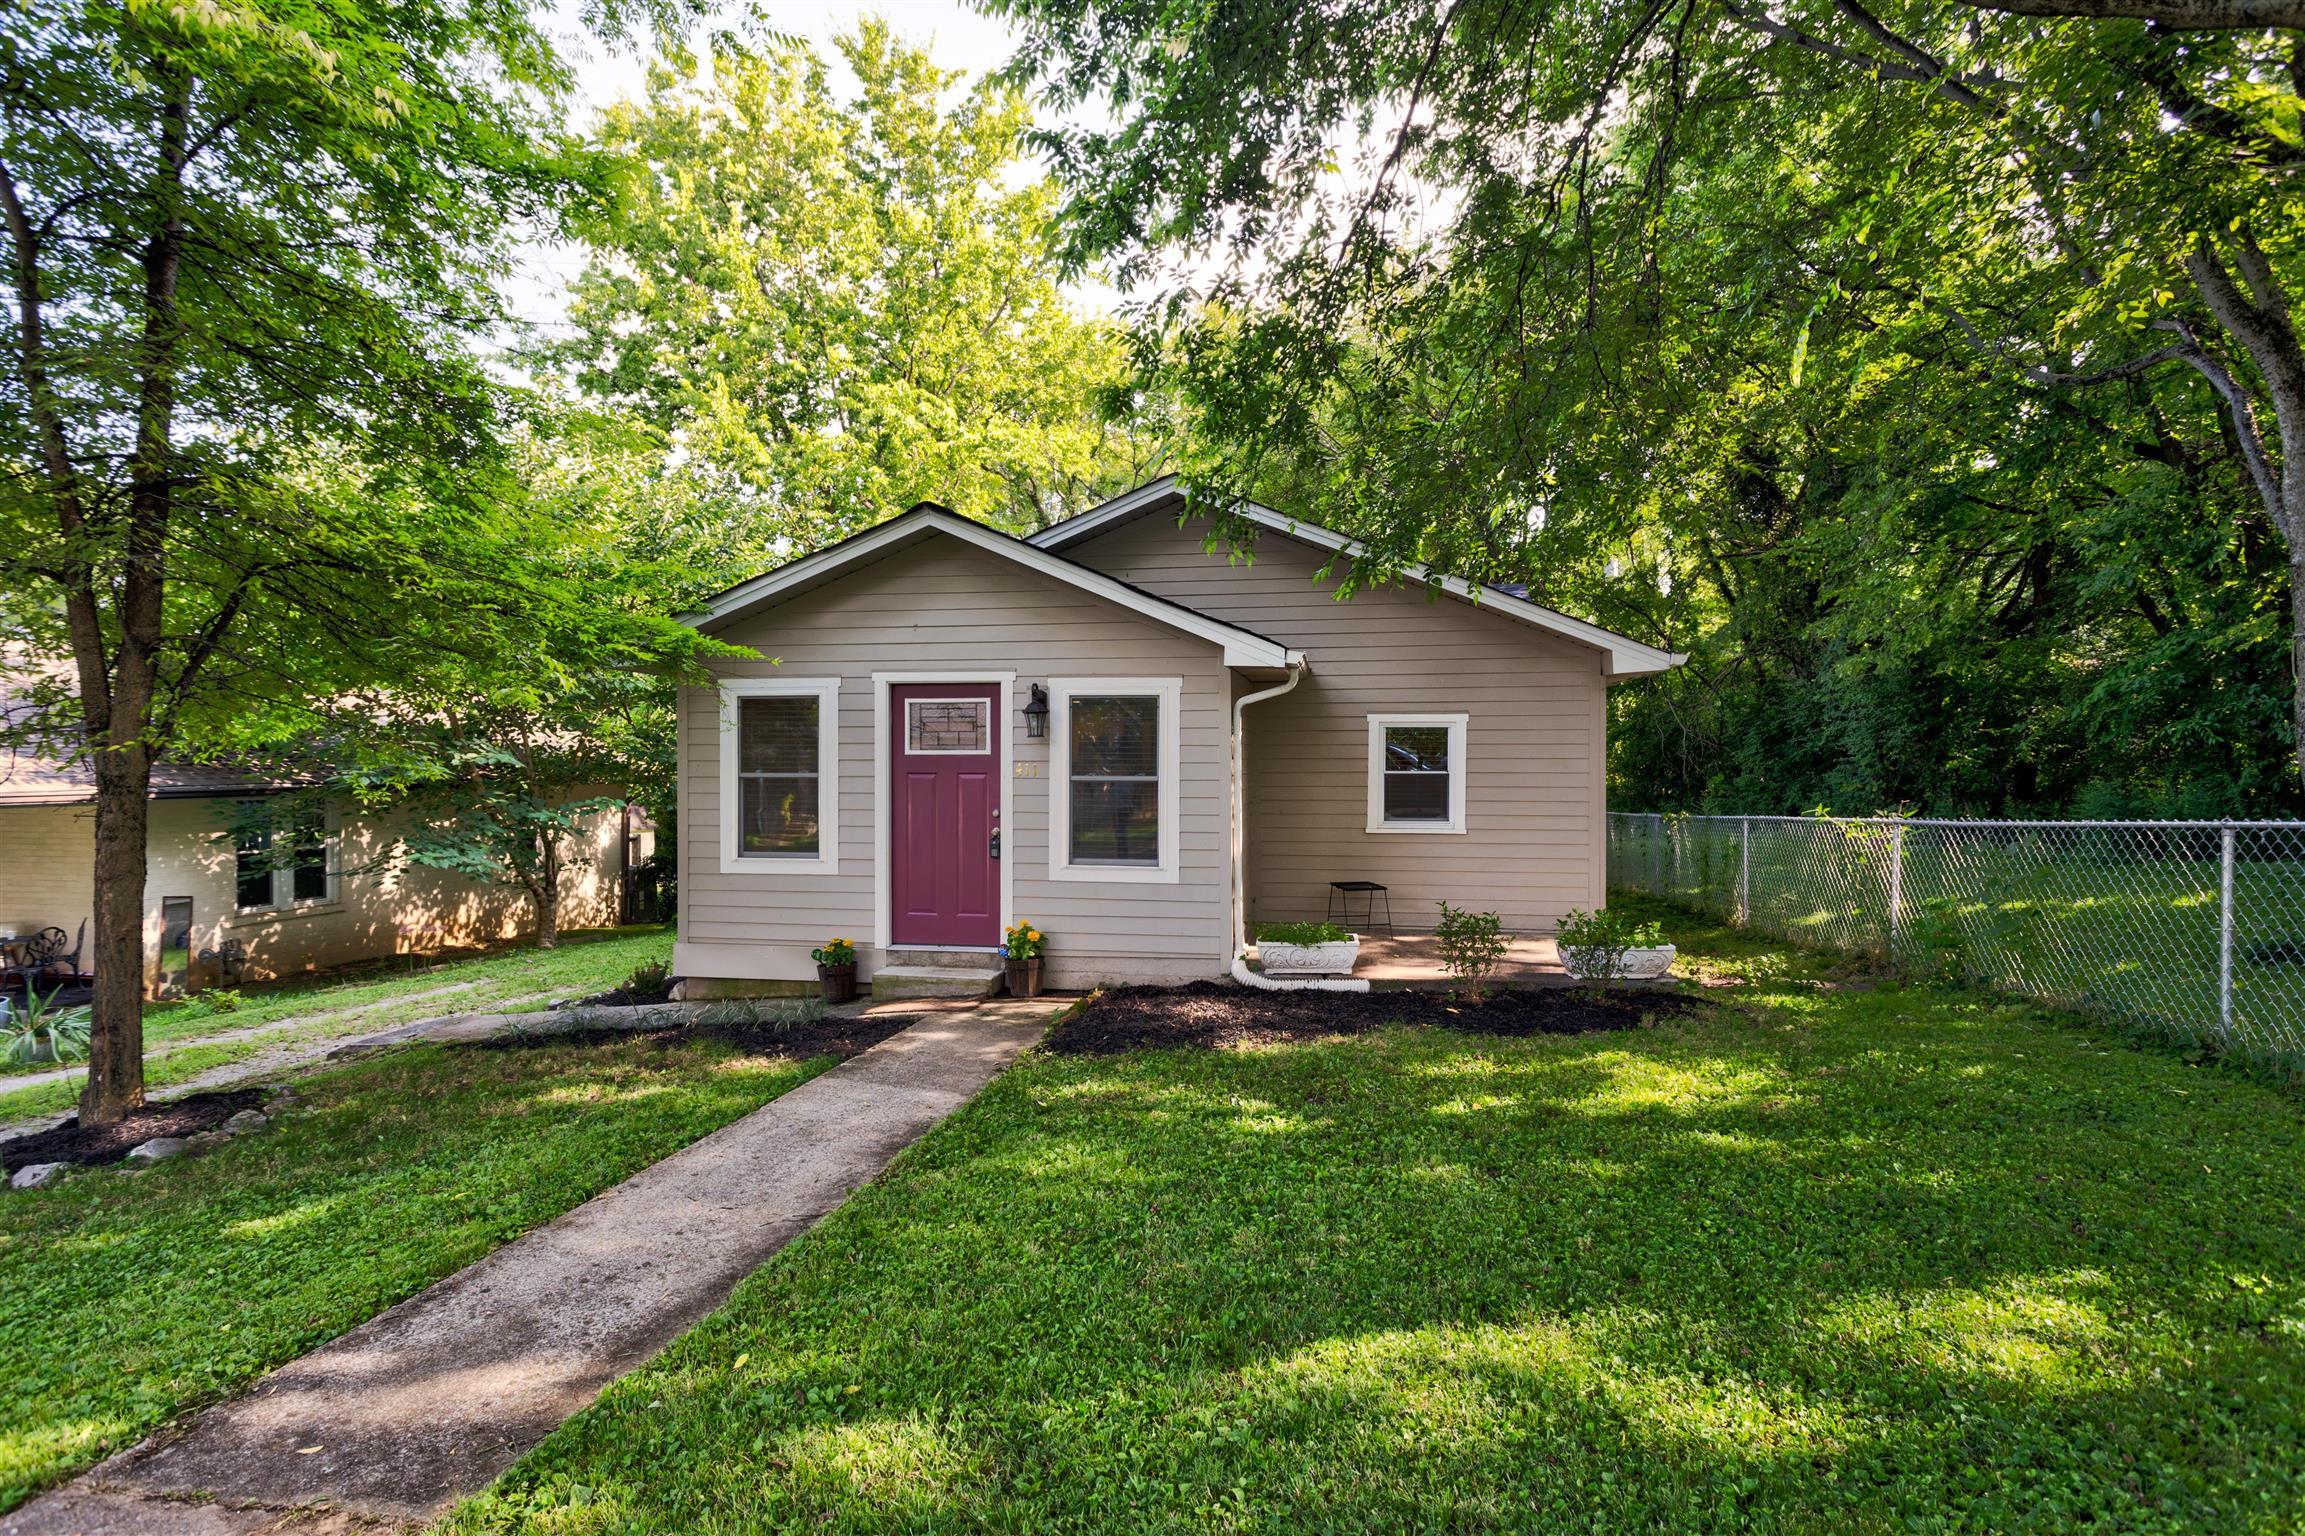 411 Patterson St, Nashville, TN 37211 - Nashville, TN real estate listing